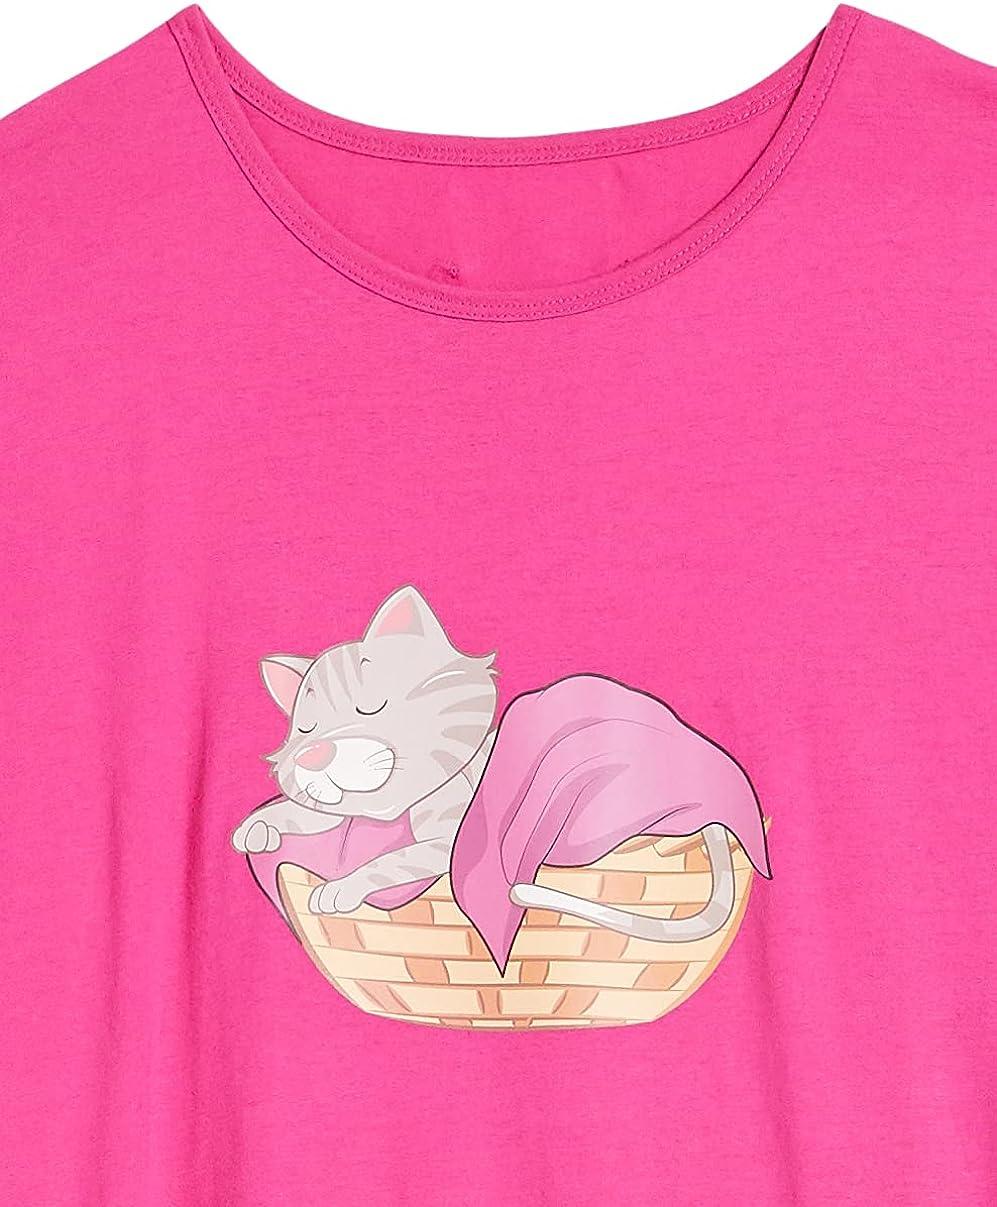 AmeriMark Women's T-Shirt Nightgowns Set – Cotton-Rich Soft Jersey Sleep Shirts